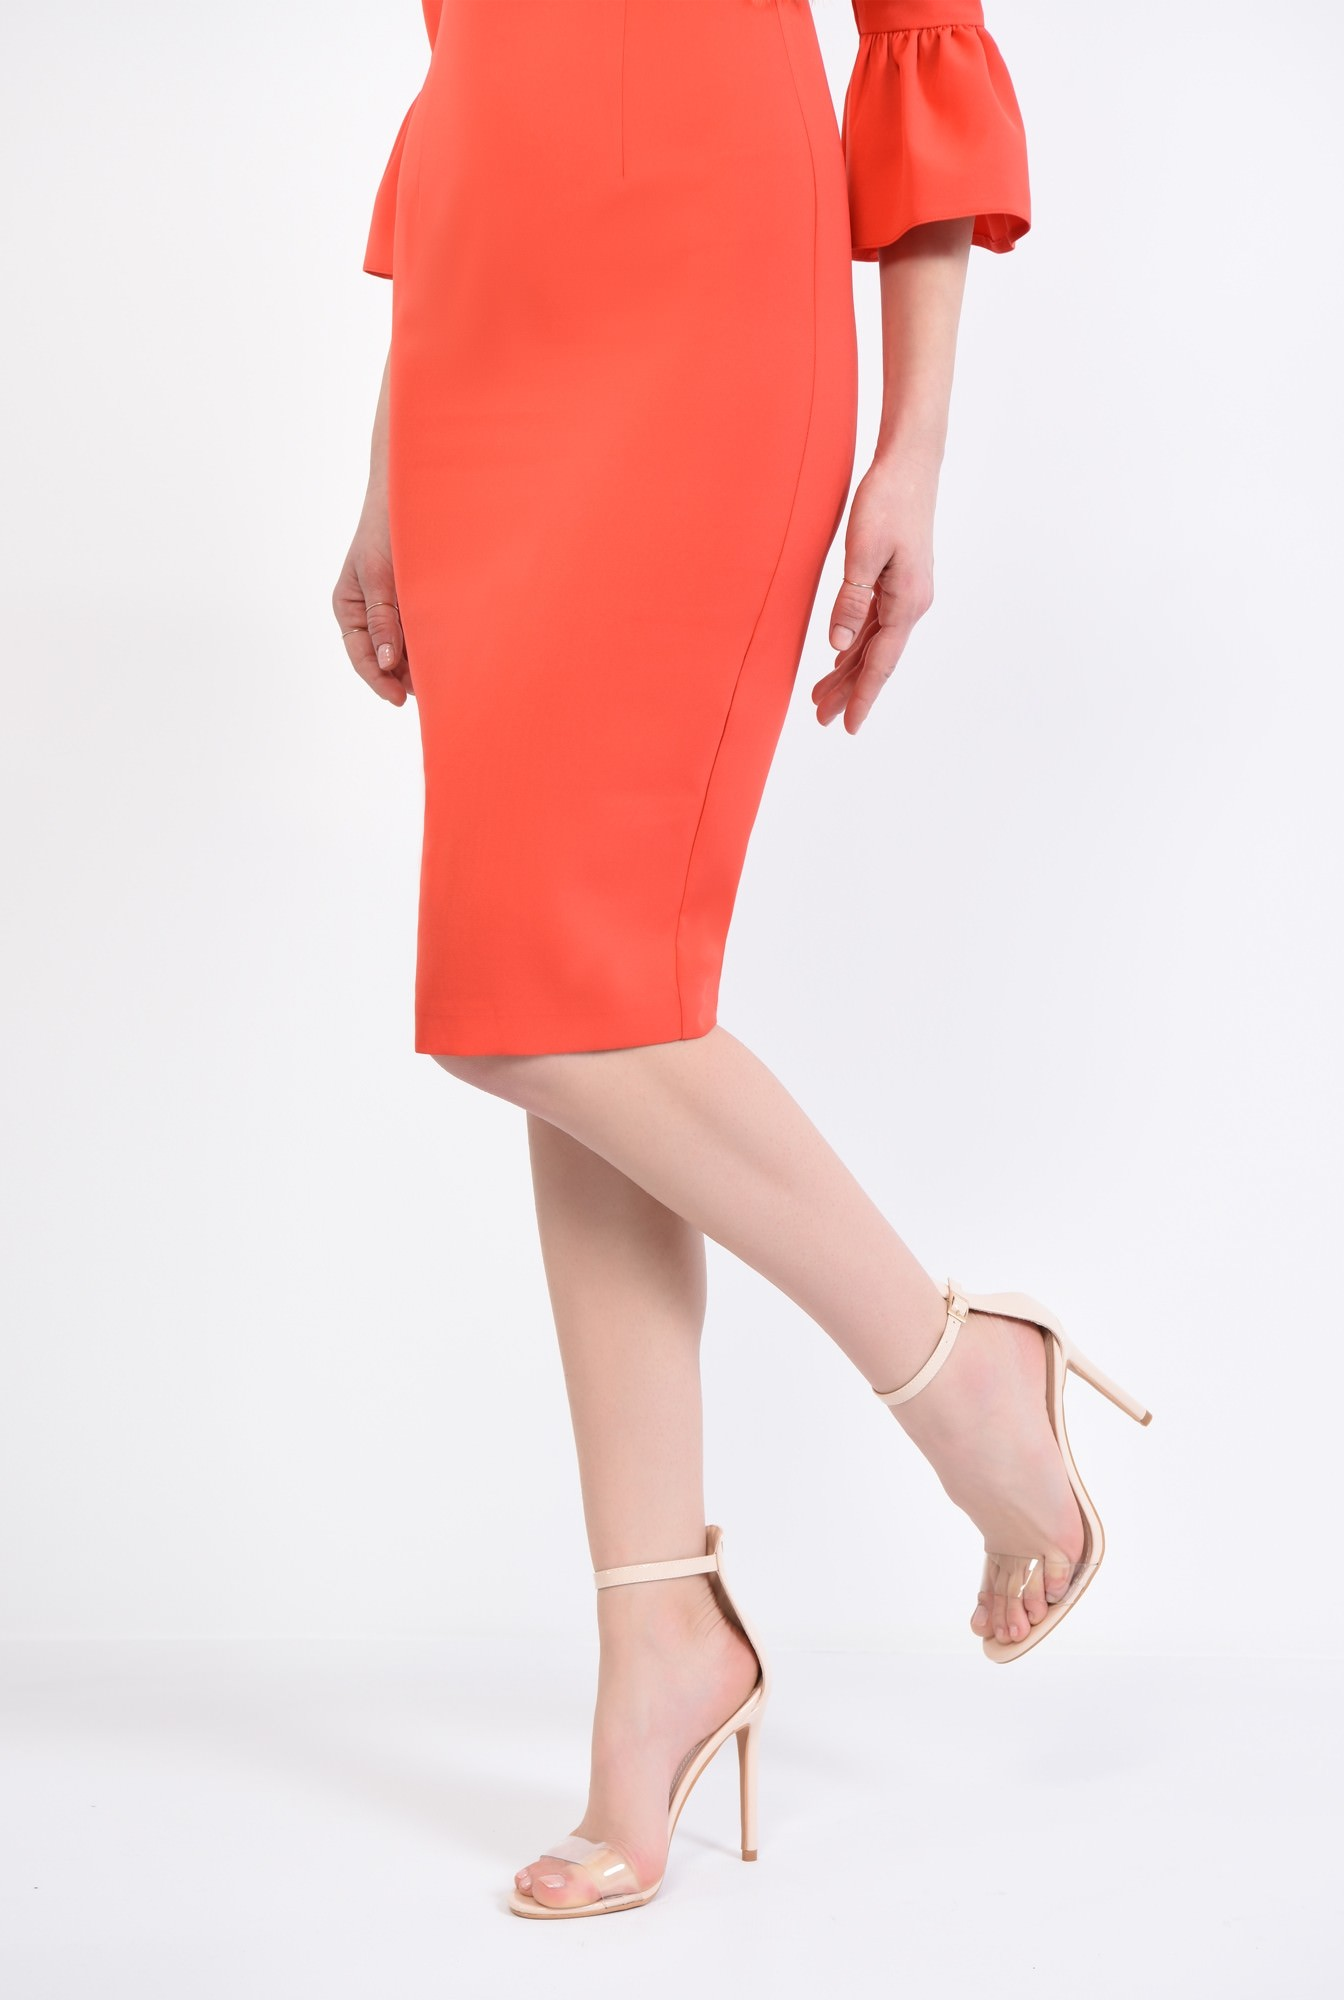 1 - sandale elegante, nude, lac, stiletto